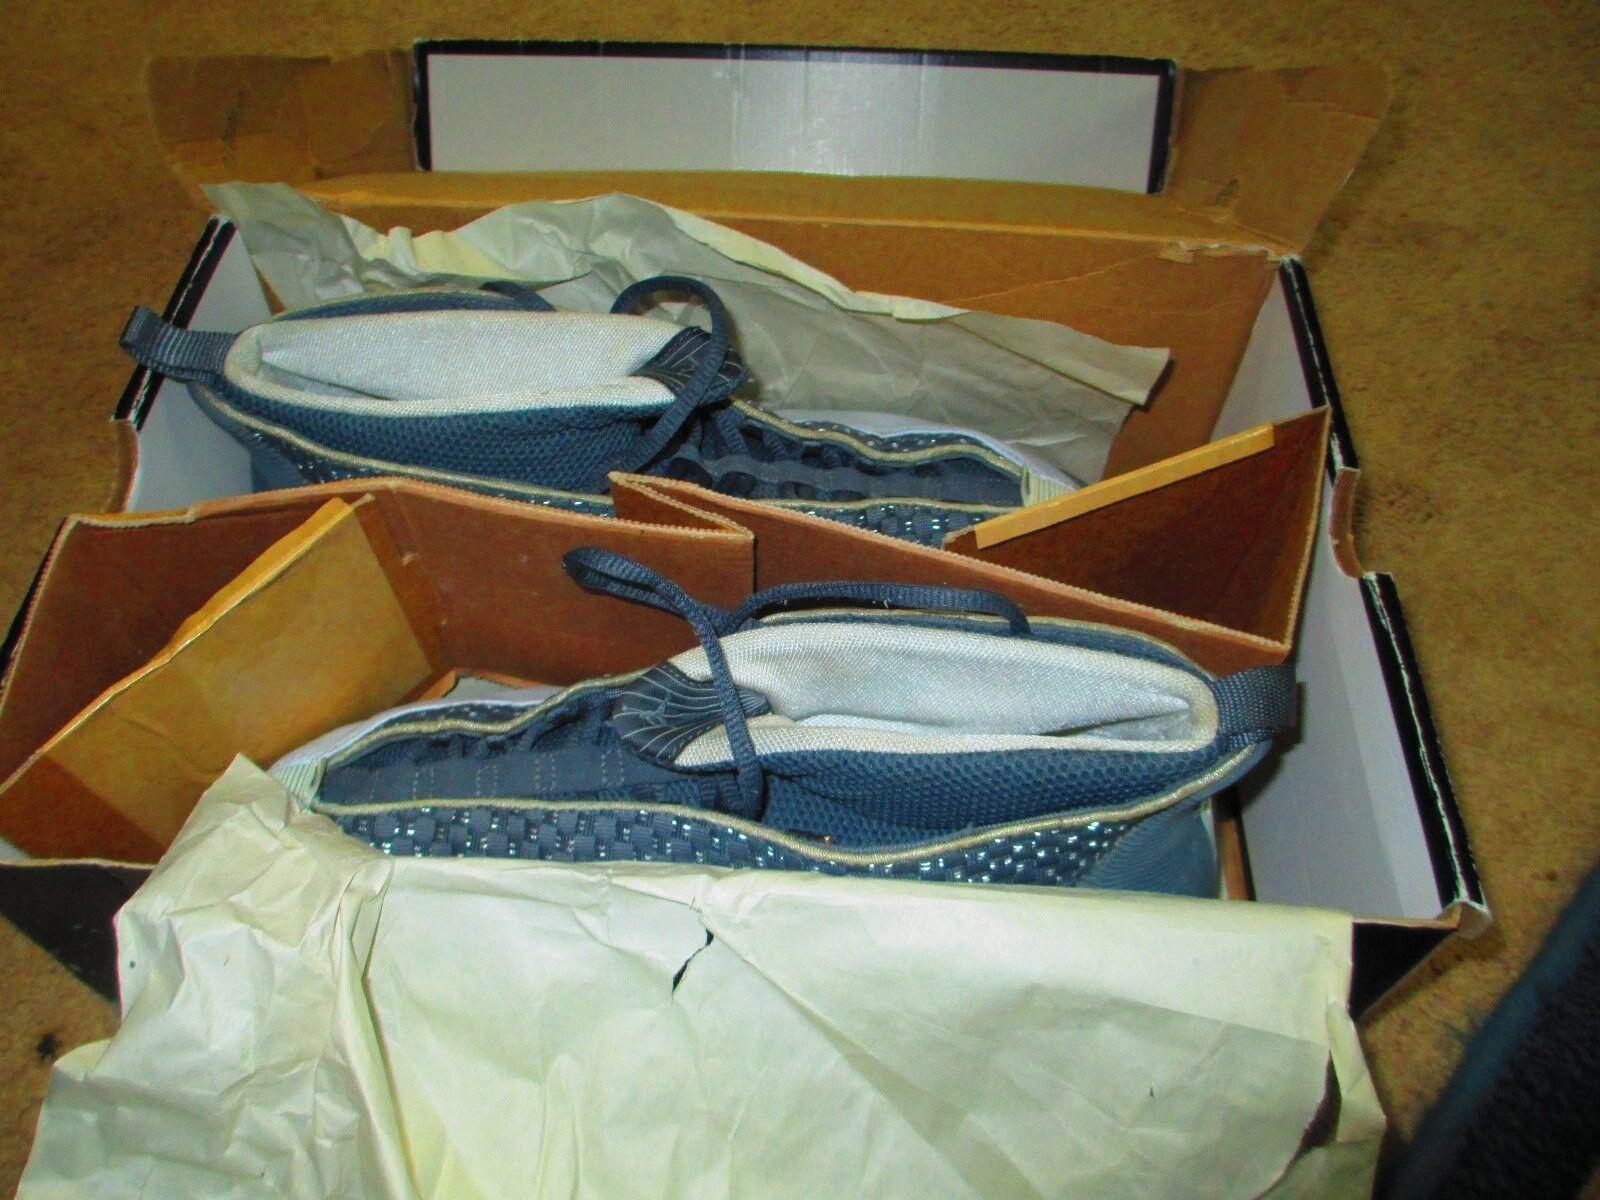 AIR JORDAN 15 / FLINT GREY-WHITE /ORIGINAL CON./CLEAN CONDITD 2000/ BOX INCLUDED Cheap and beautiful fashion